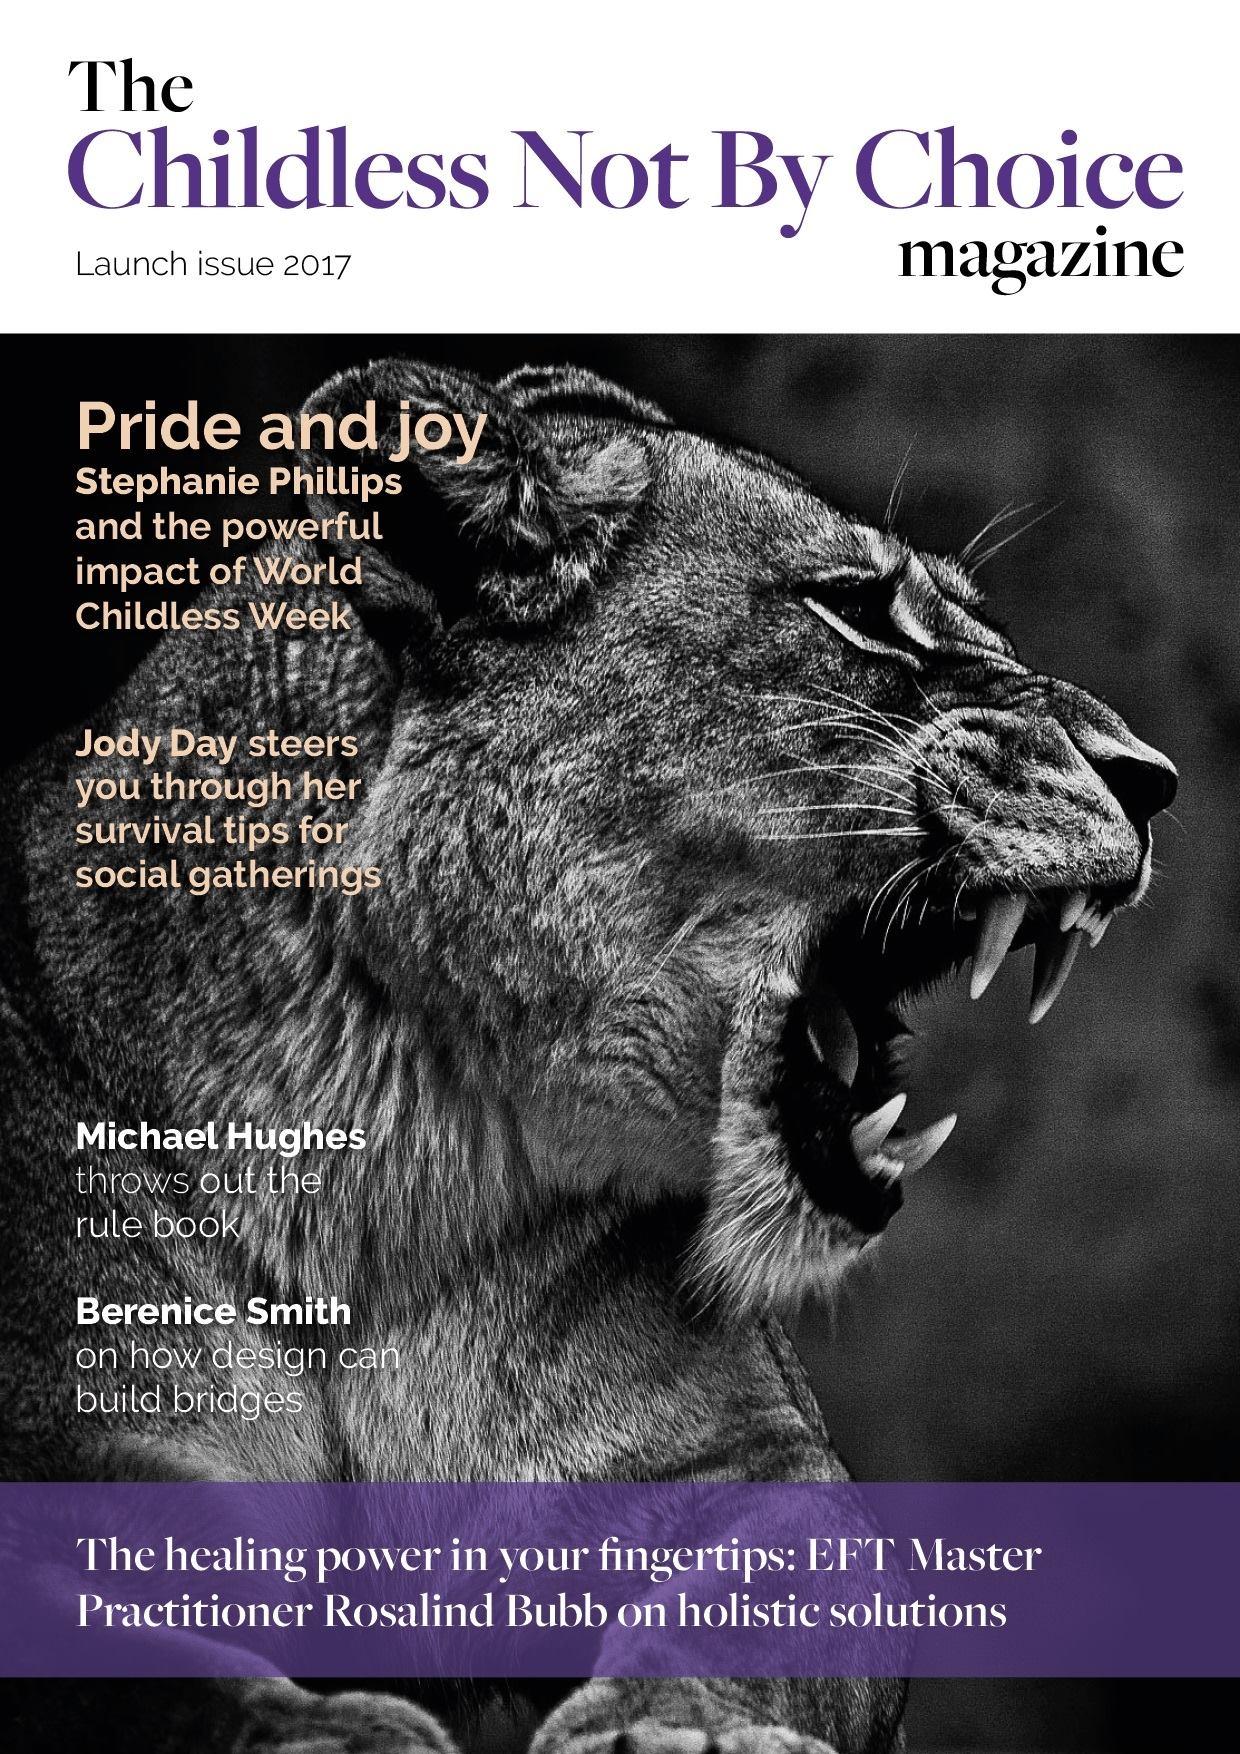 Rosalind-Image 4 - CNBC magazine cover.jpg